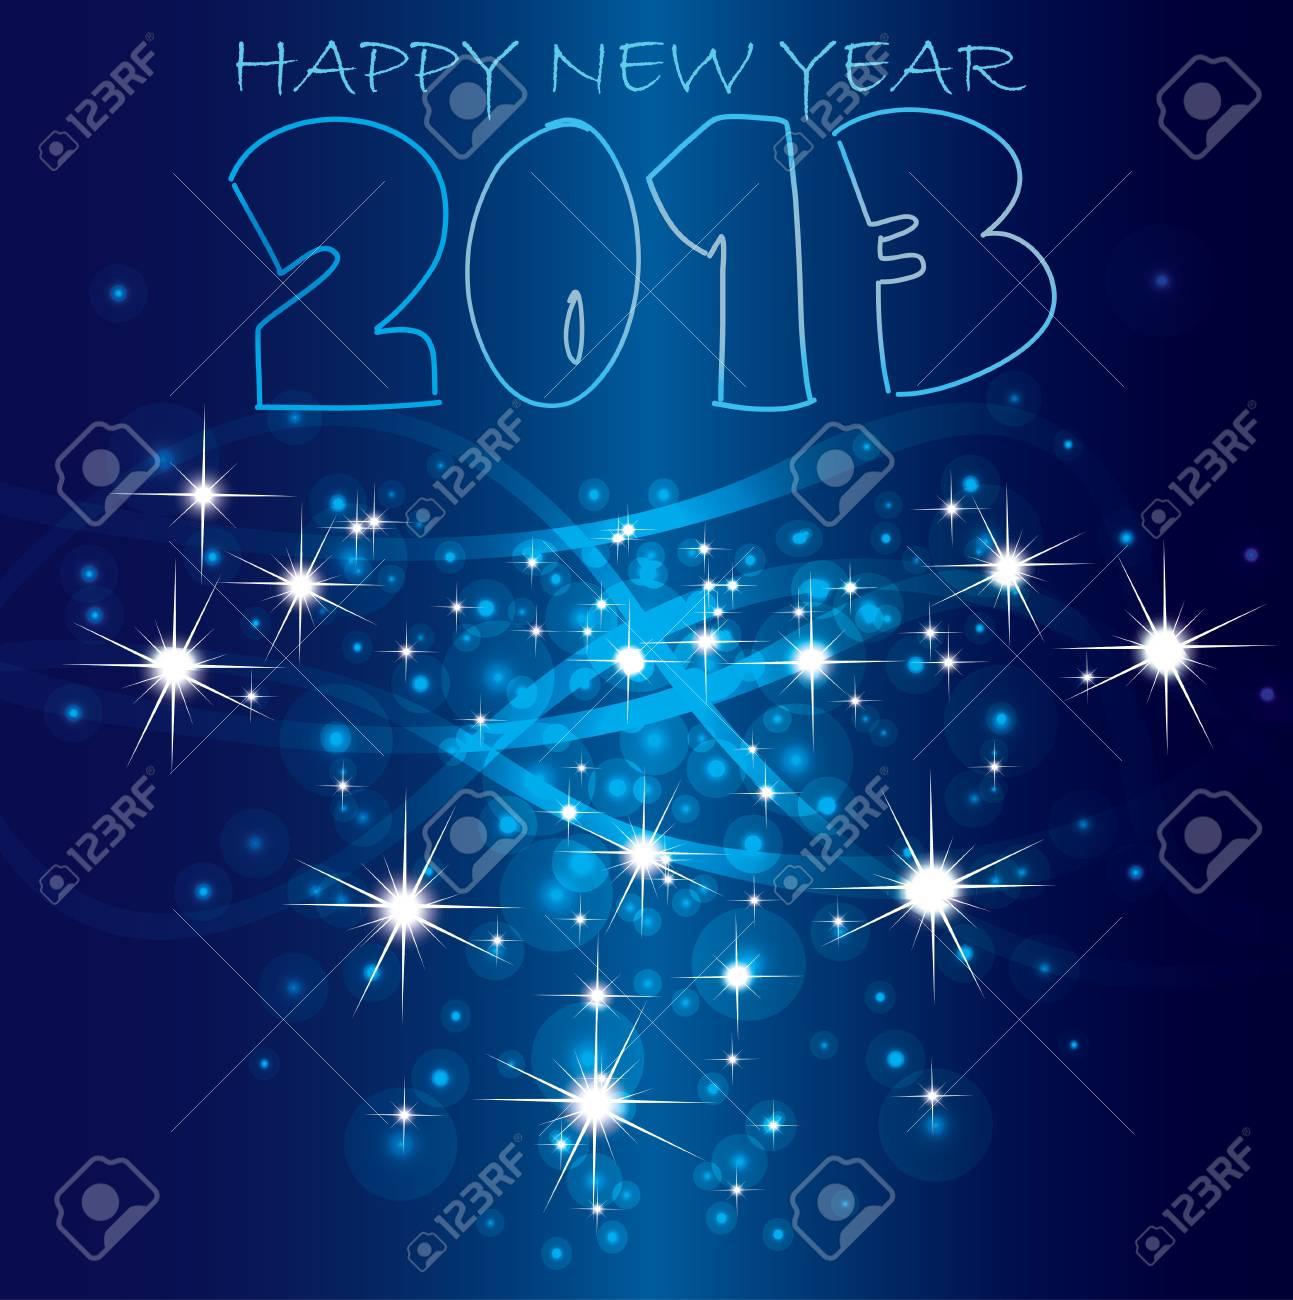 2013 Happy New Year background  Vector Stock Vector - 16160046